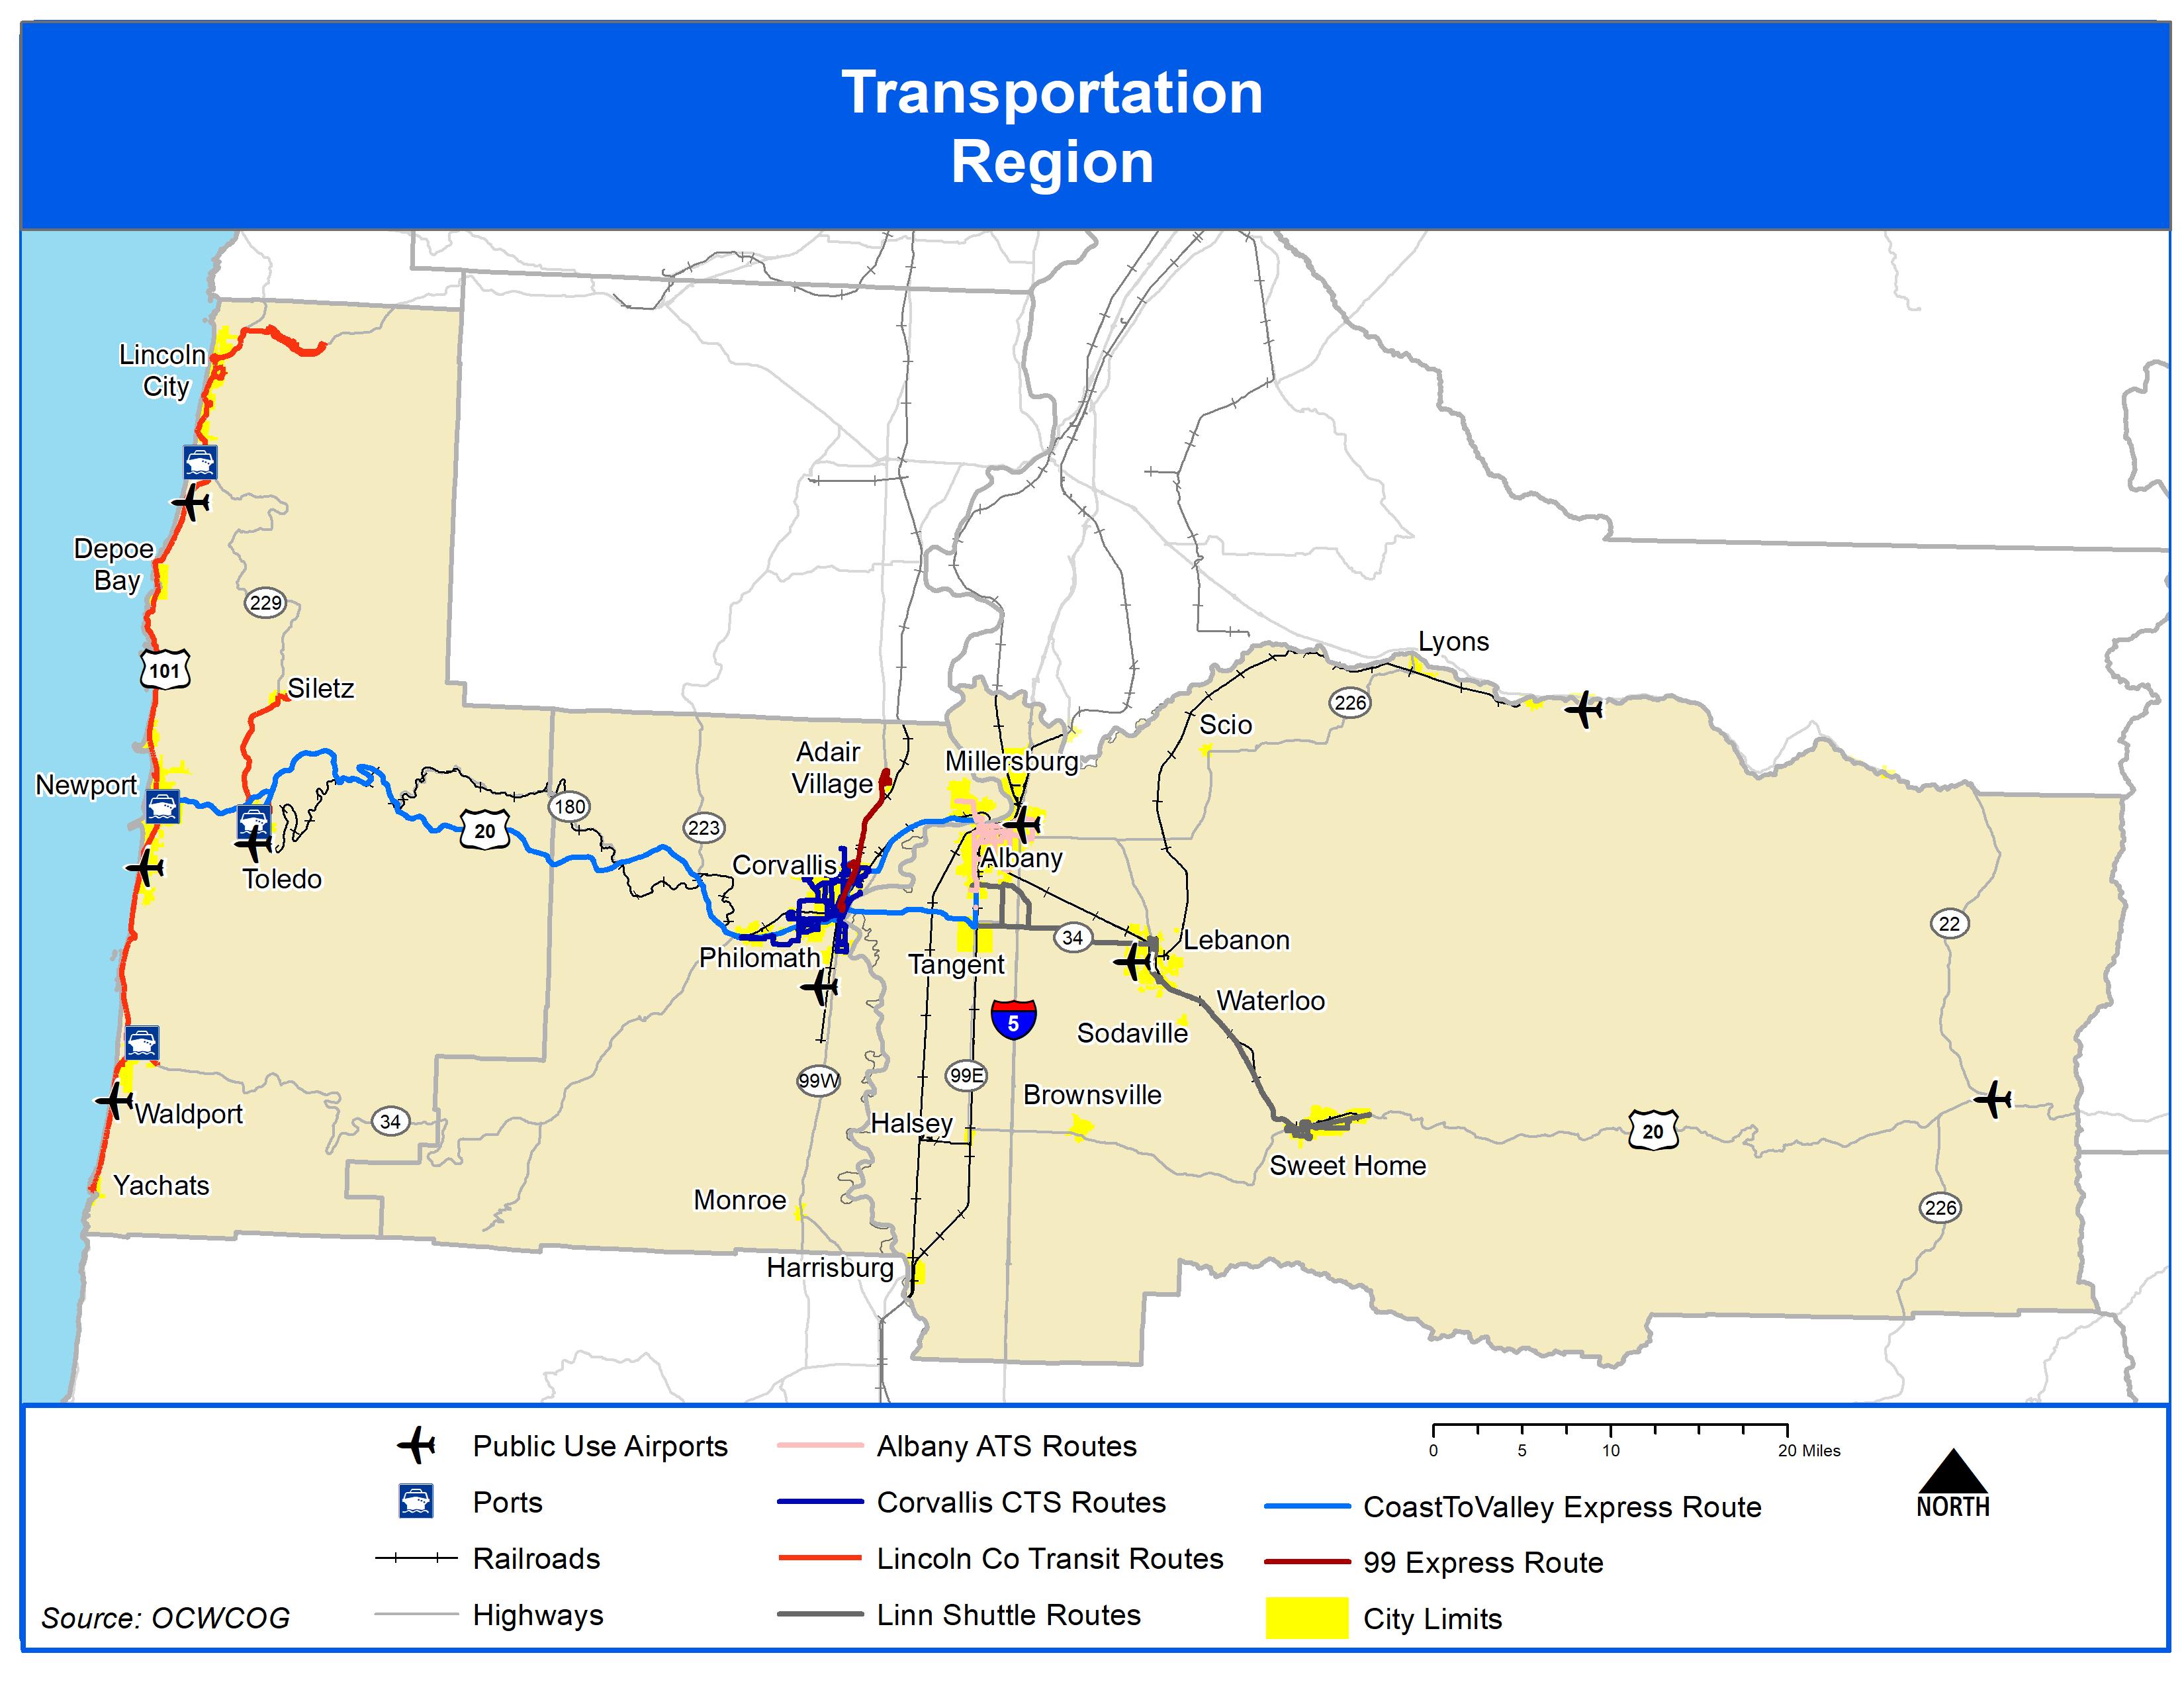 Map of Transportation in the Region 2021